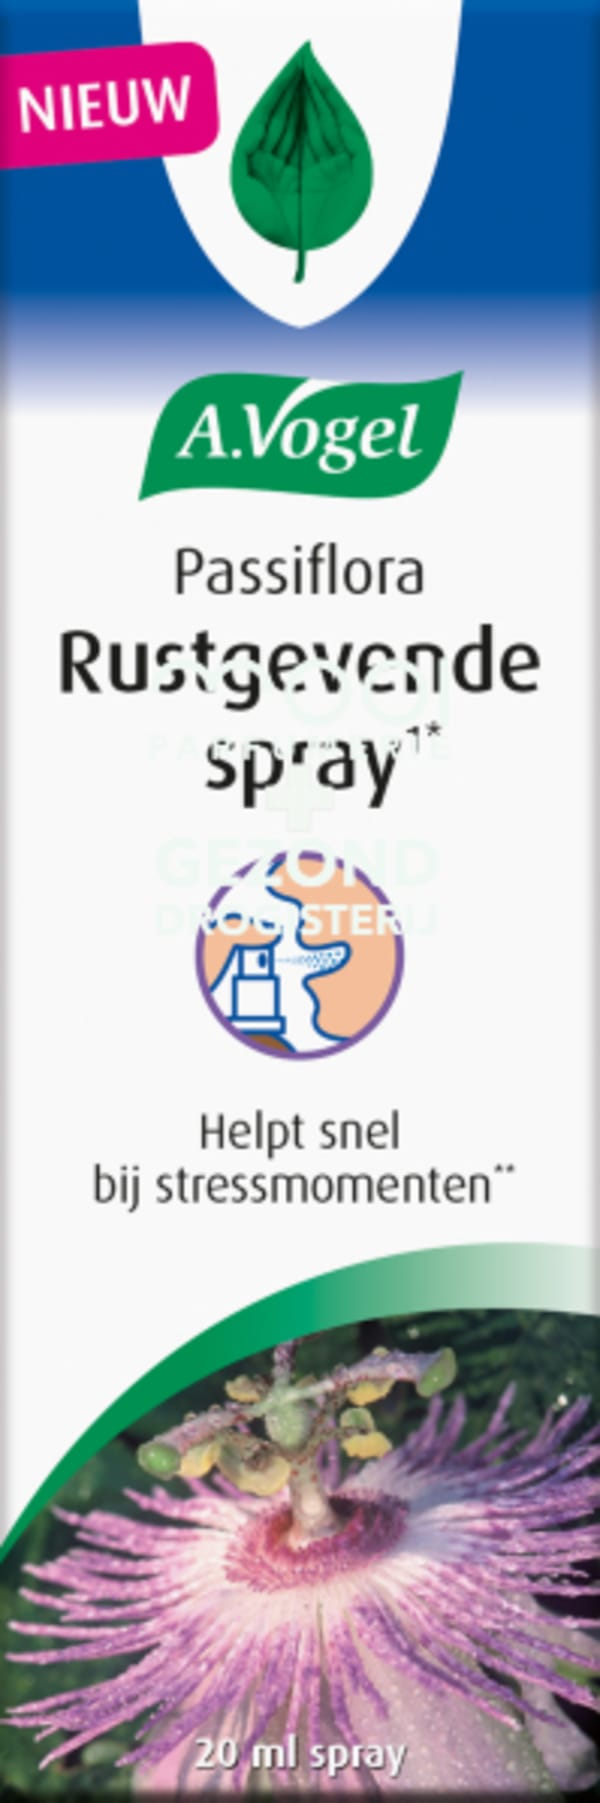 Drogisterij Parfumerie MOOI van Frits - A. Vogel Passiflora Rustgevende Spray 20 ml